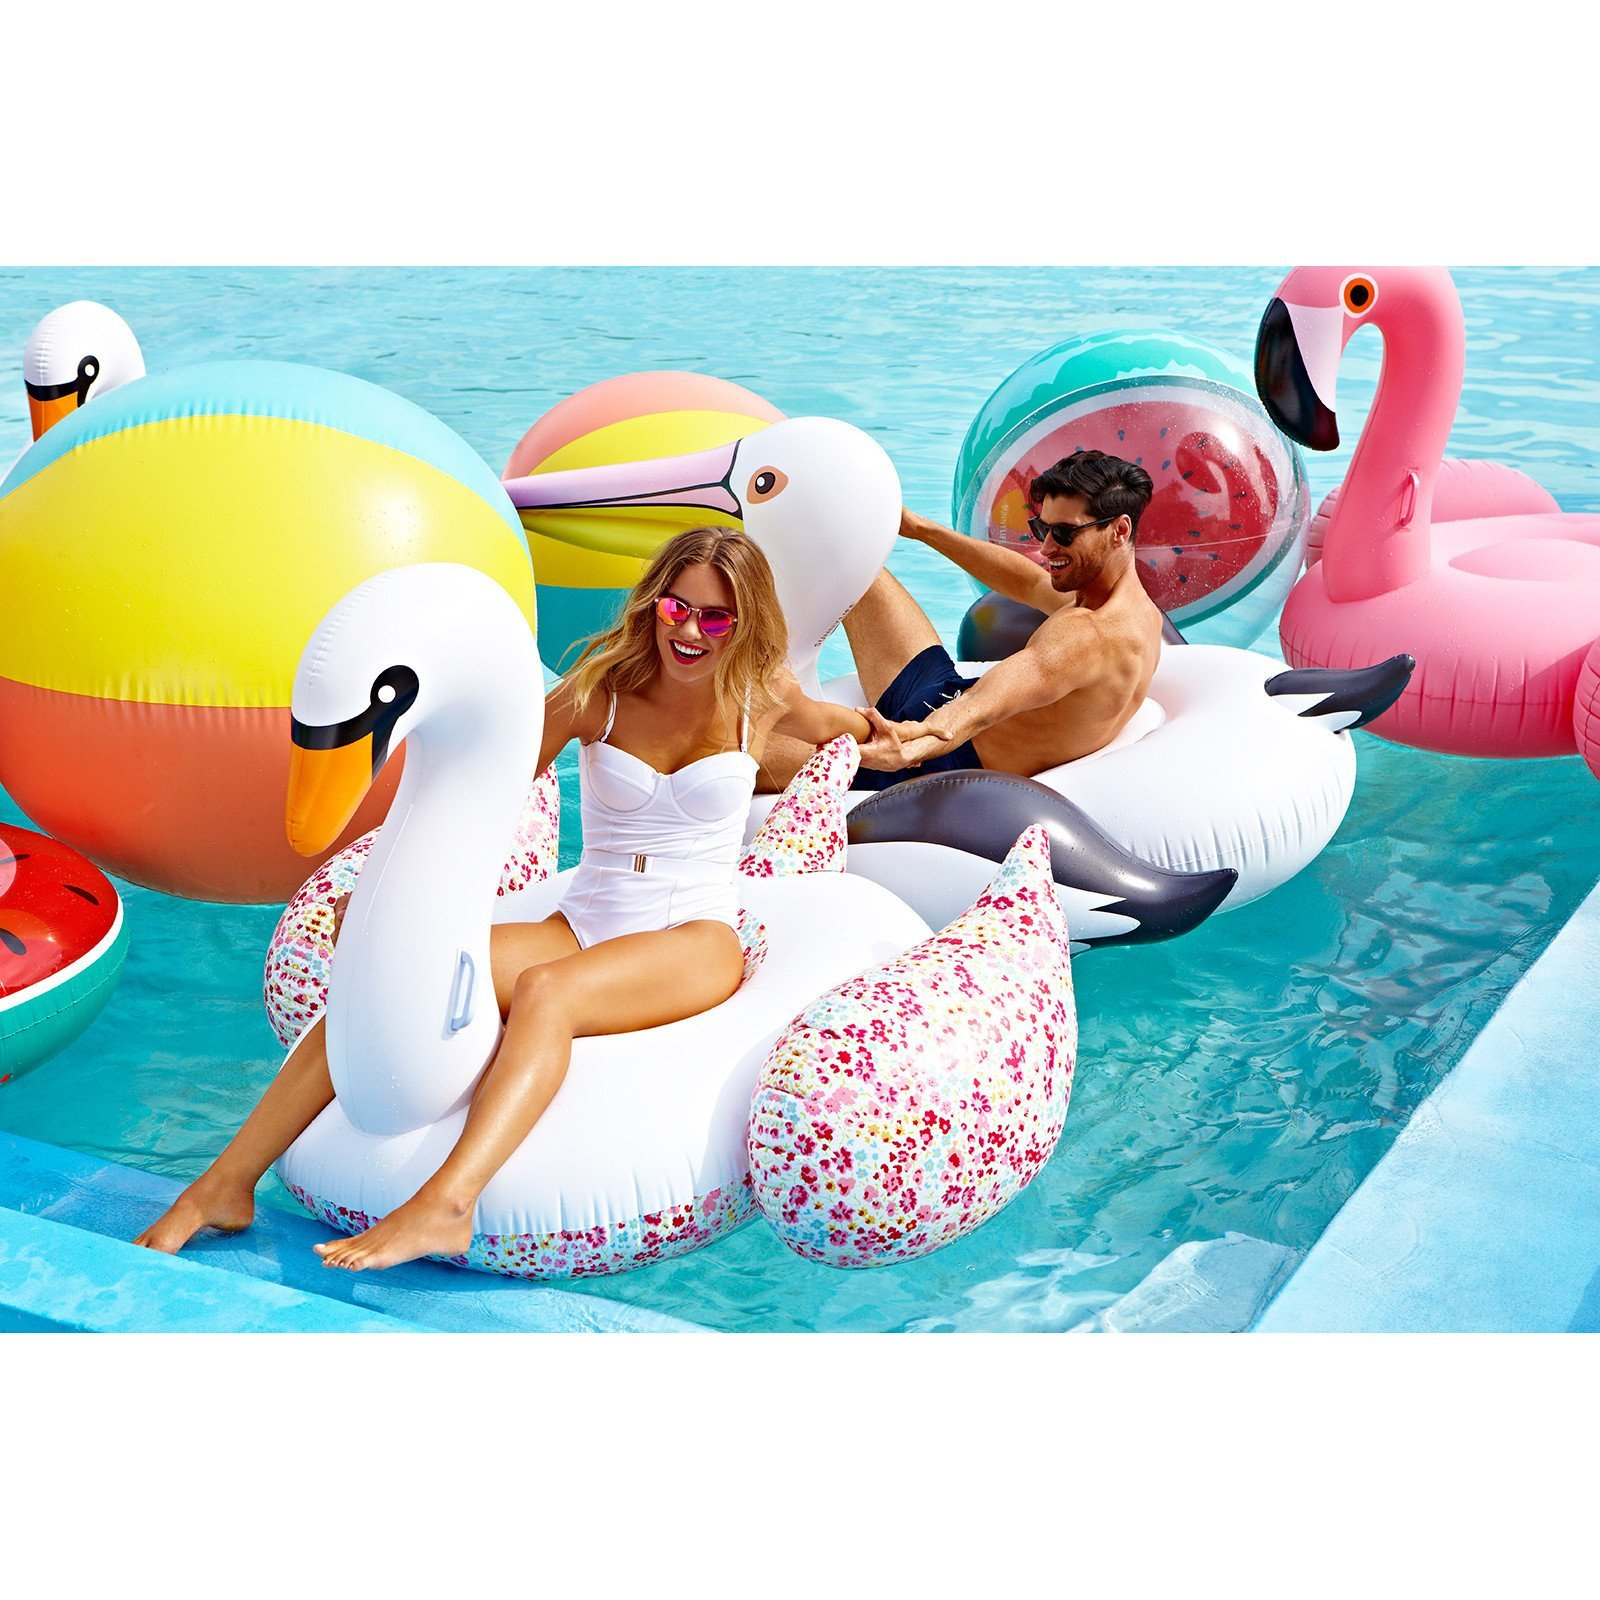 Sunnylife Luxury Adult Inflatable Pool Float Ride On Beach Toy - Pink Flamingo by SunnyLIFE (Image #5)